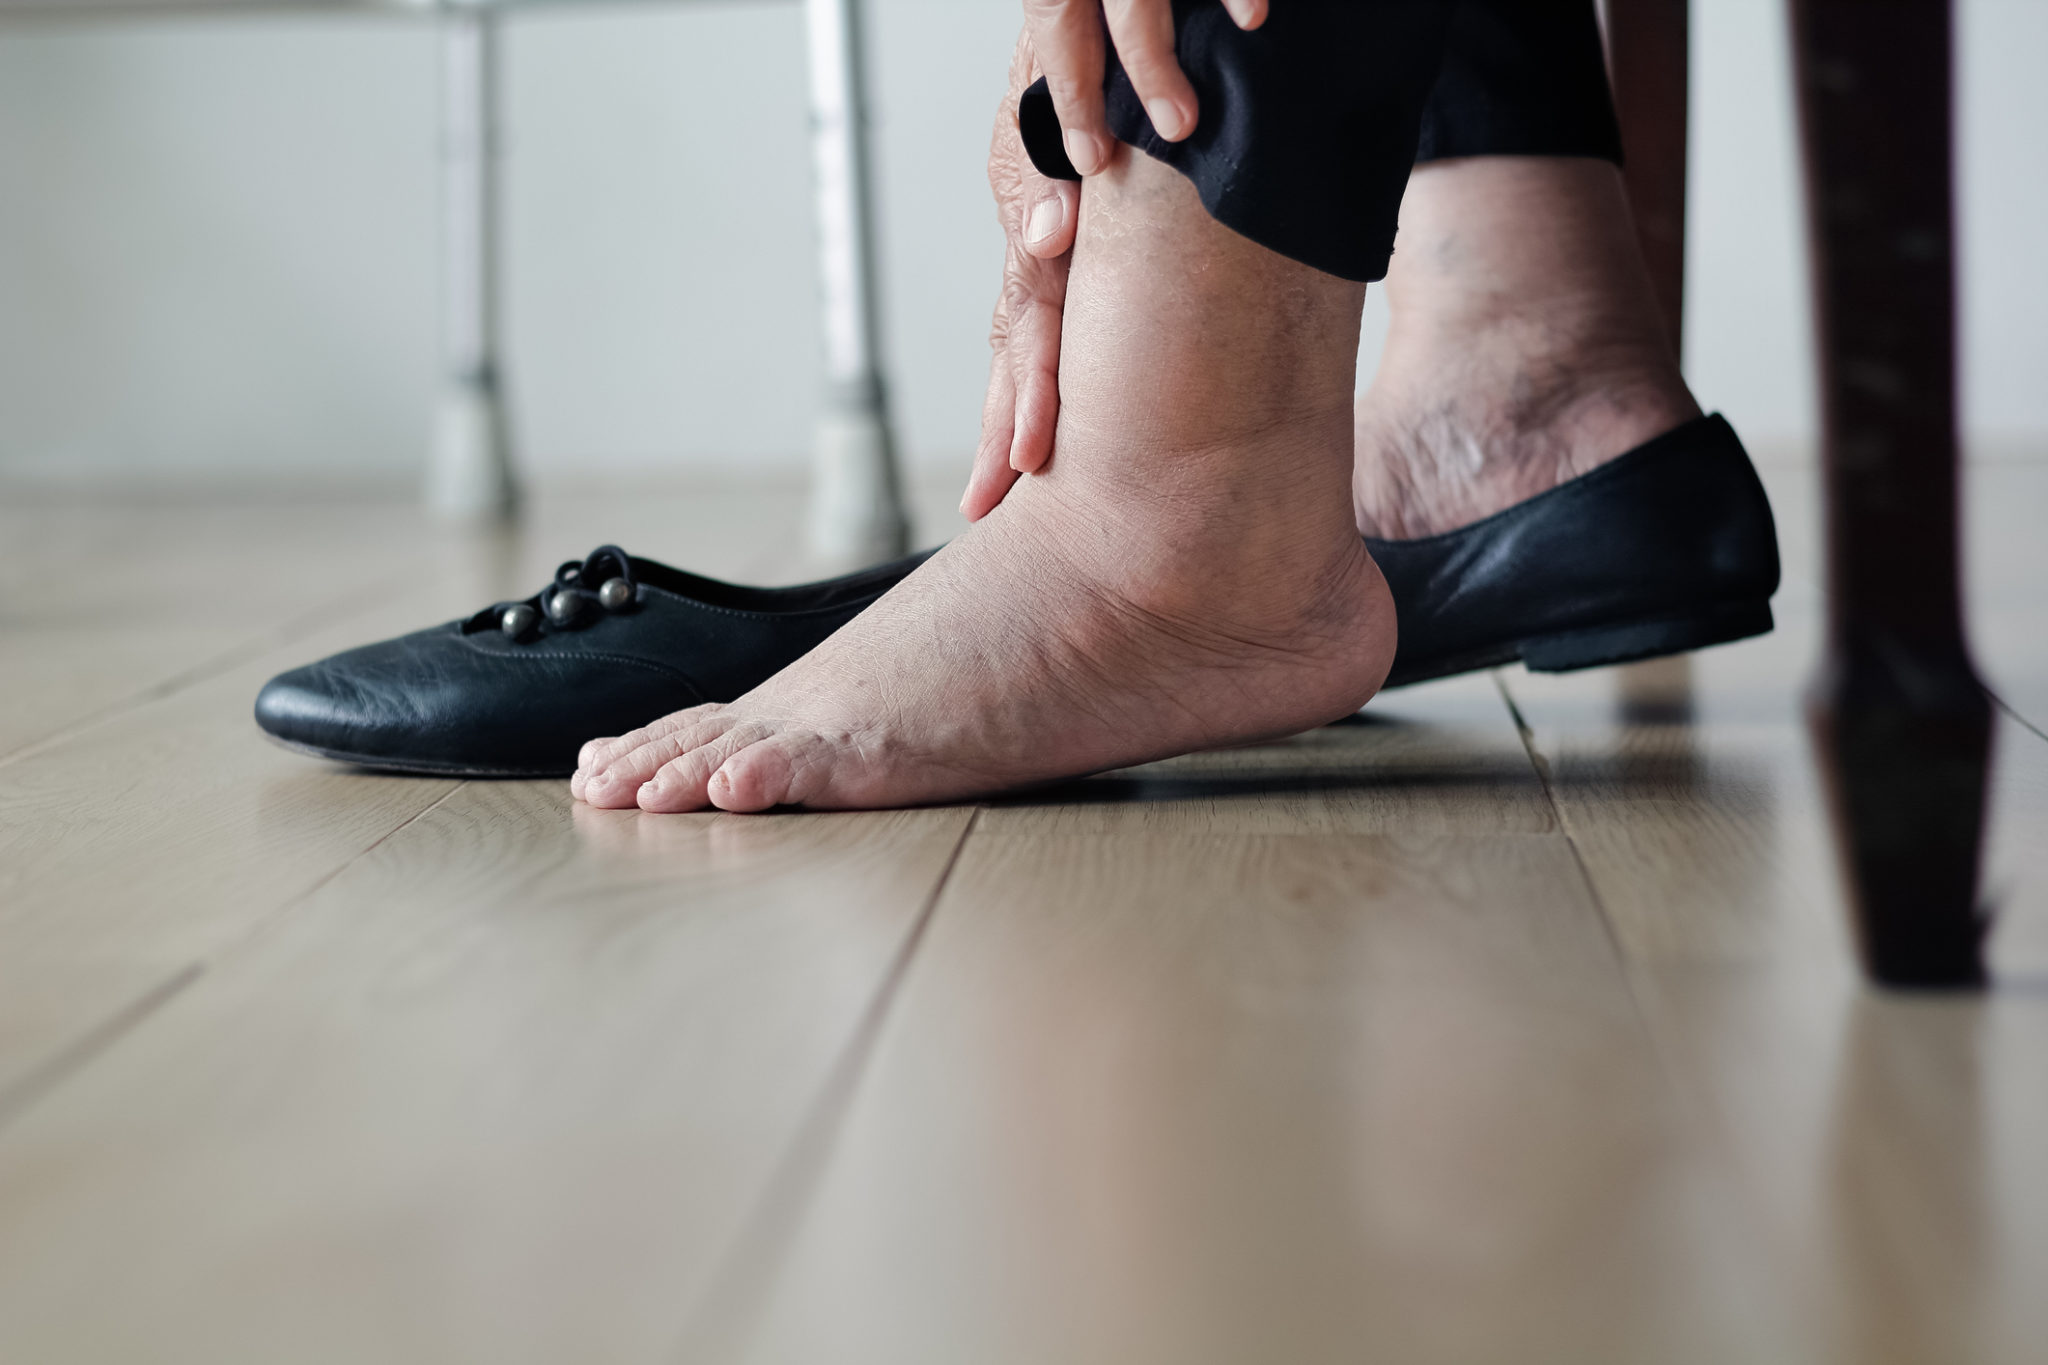 swollen feet and legs